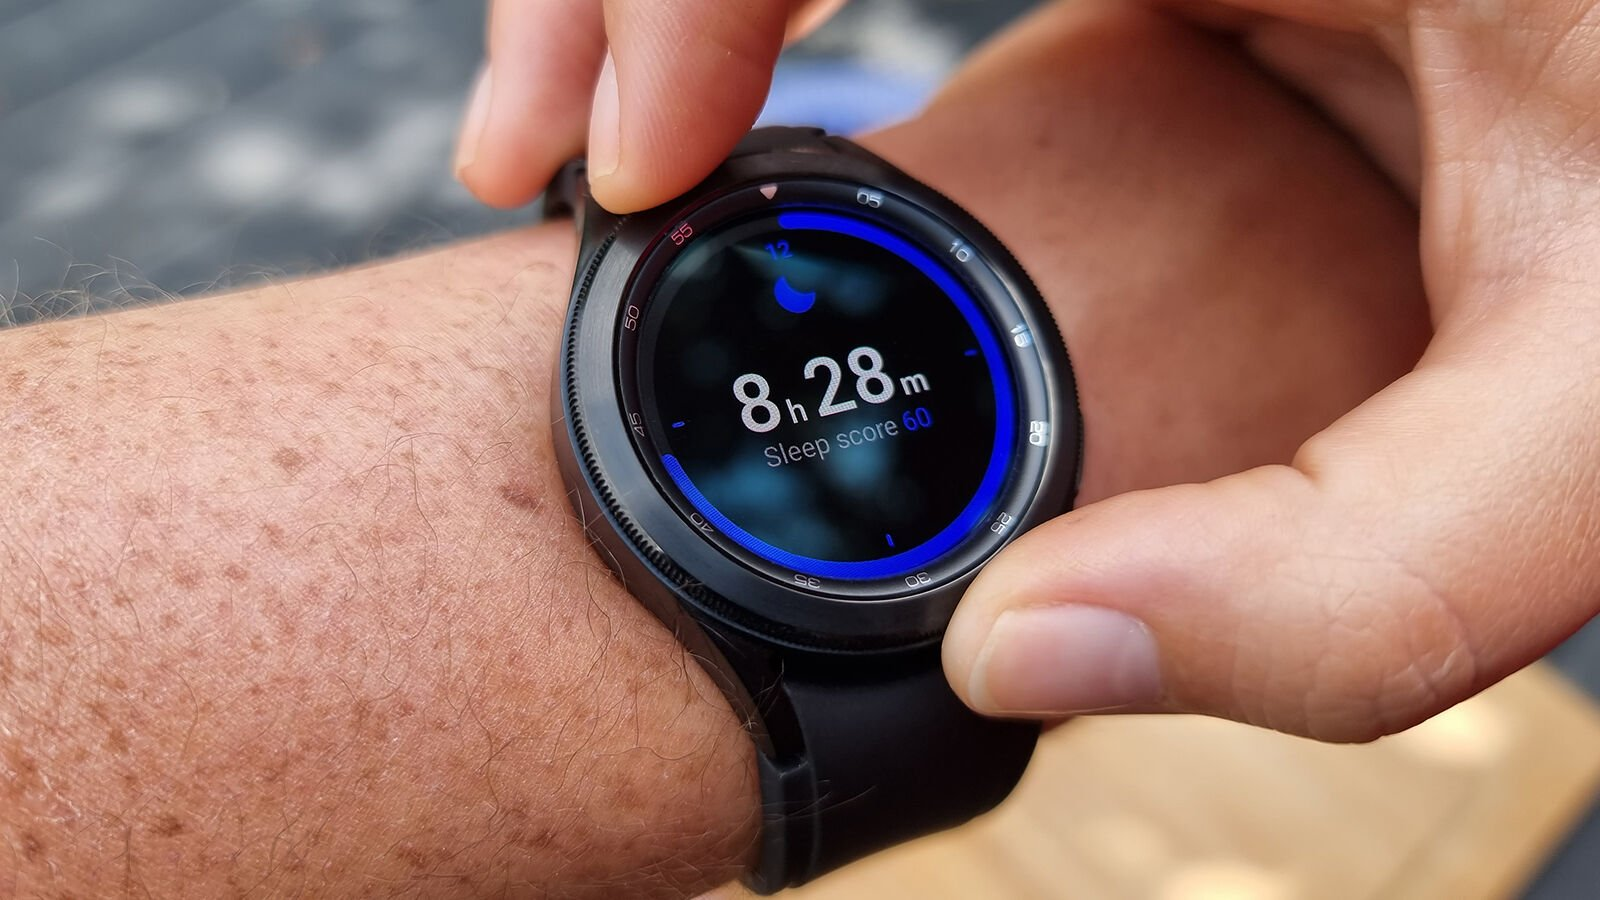 Samsung Galaxy Watch 4 Classic sleep tracking